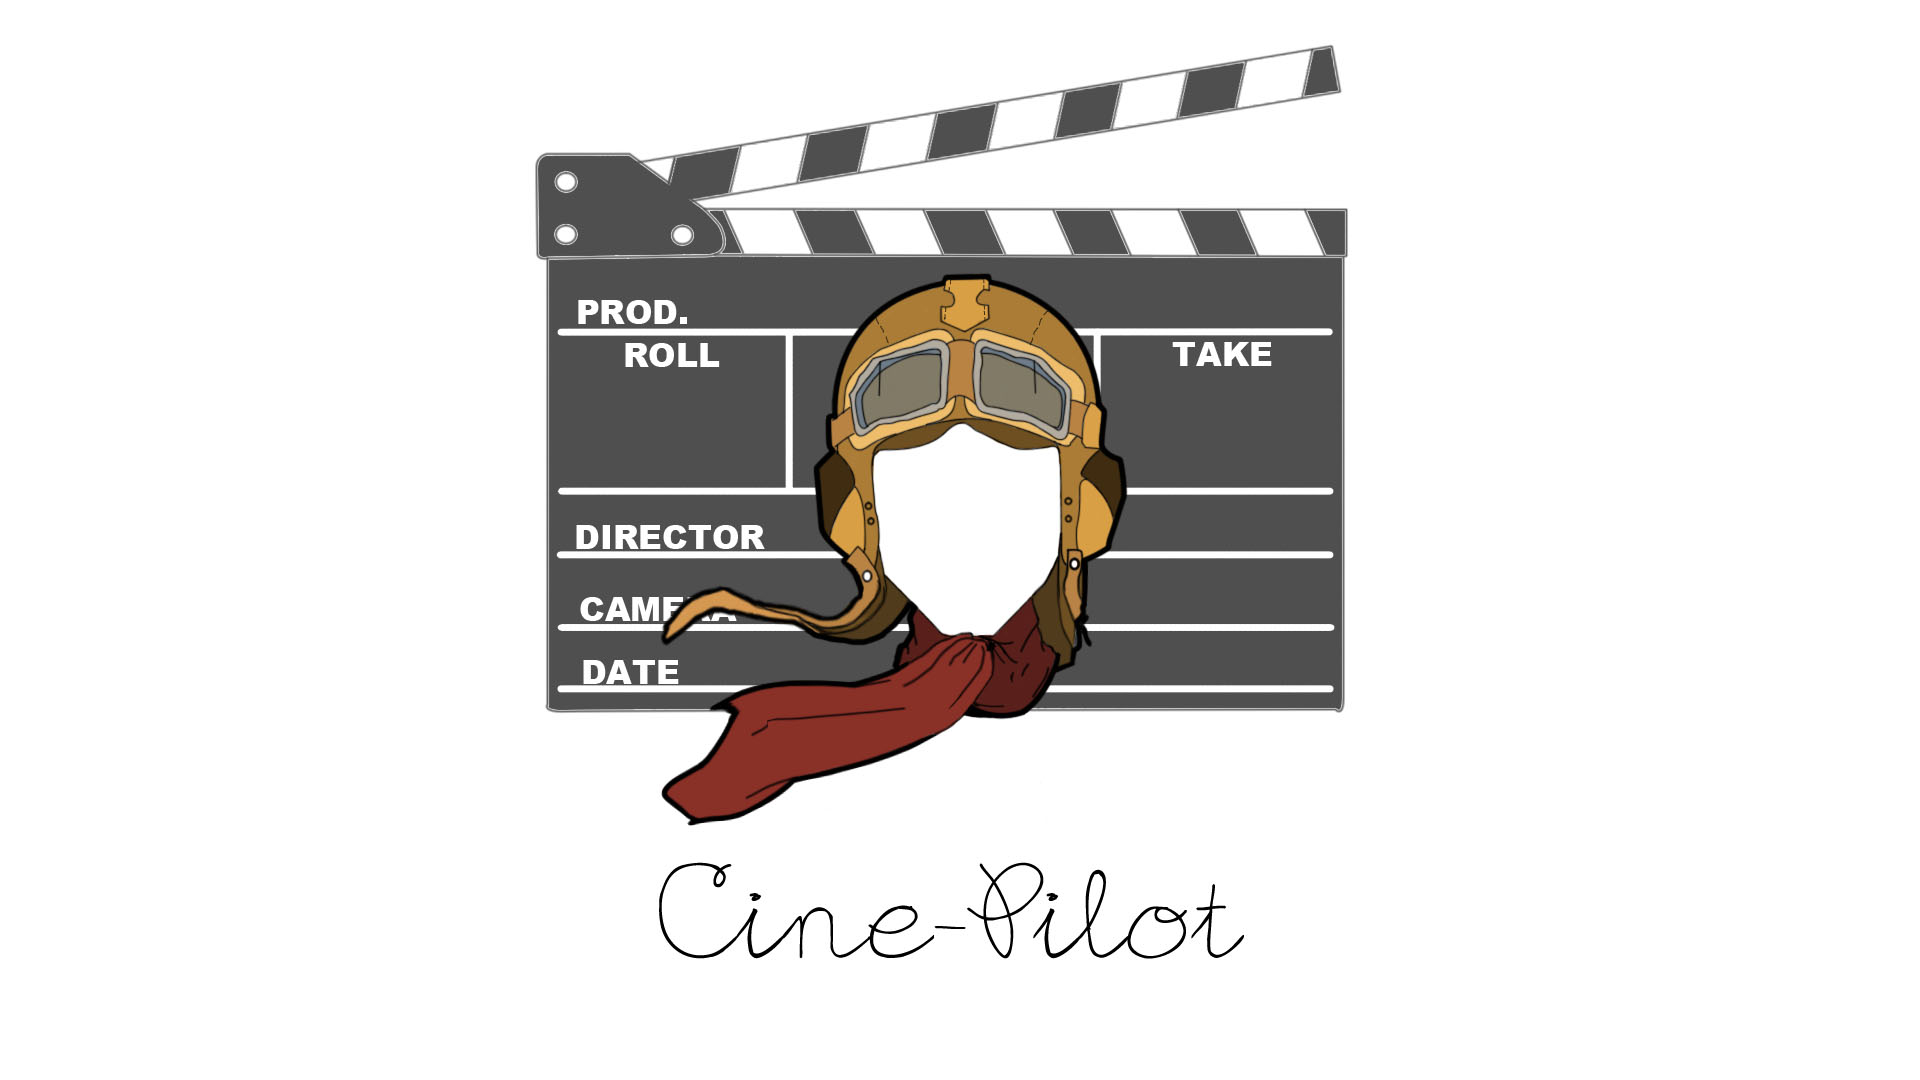 Cine pilot : Advertising.